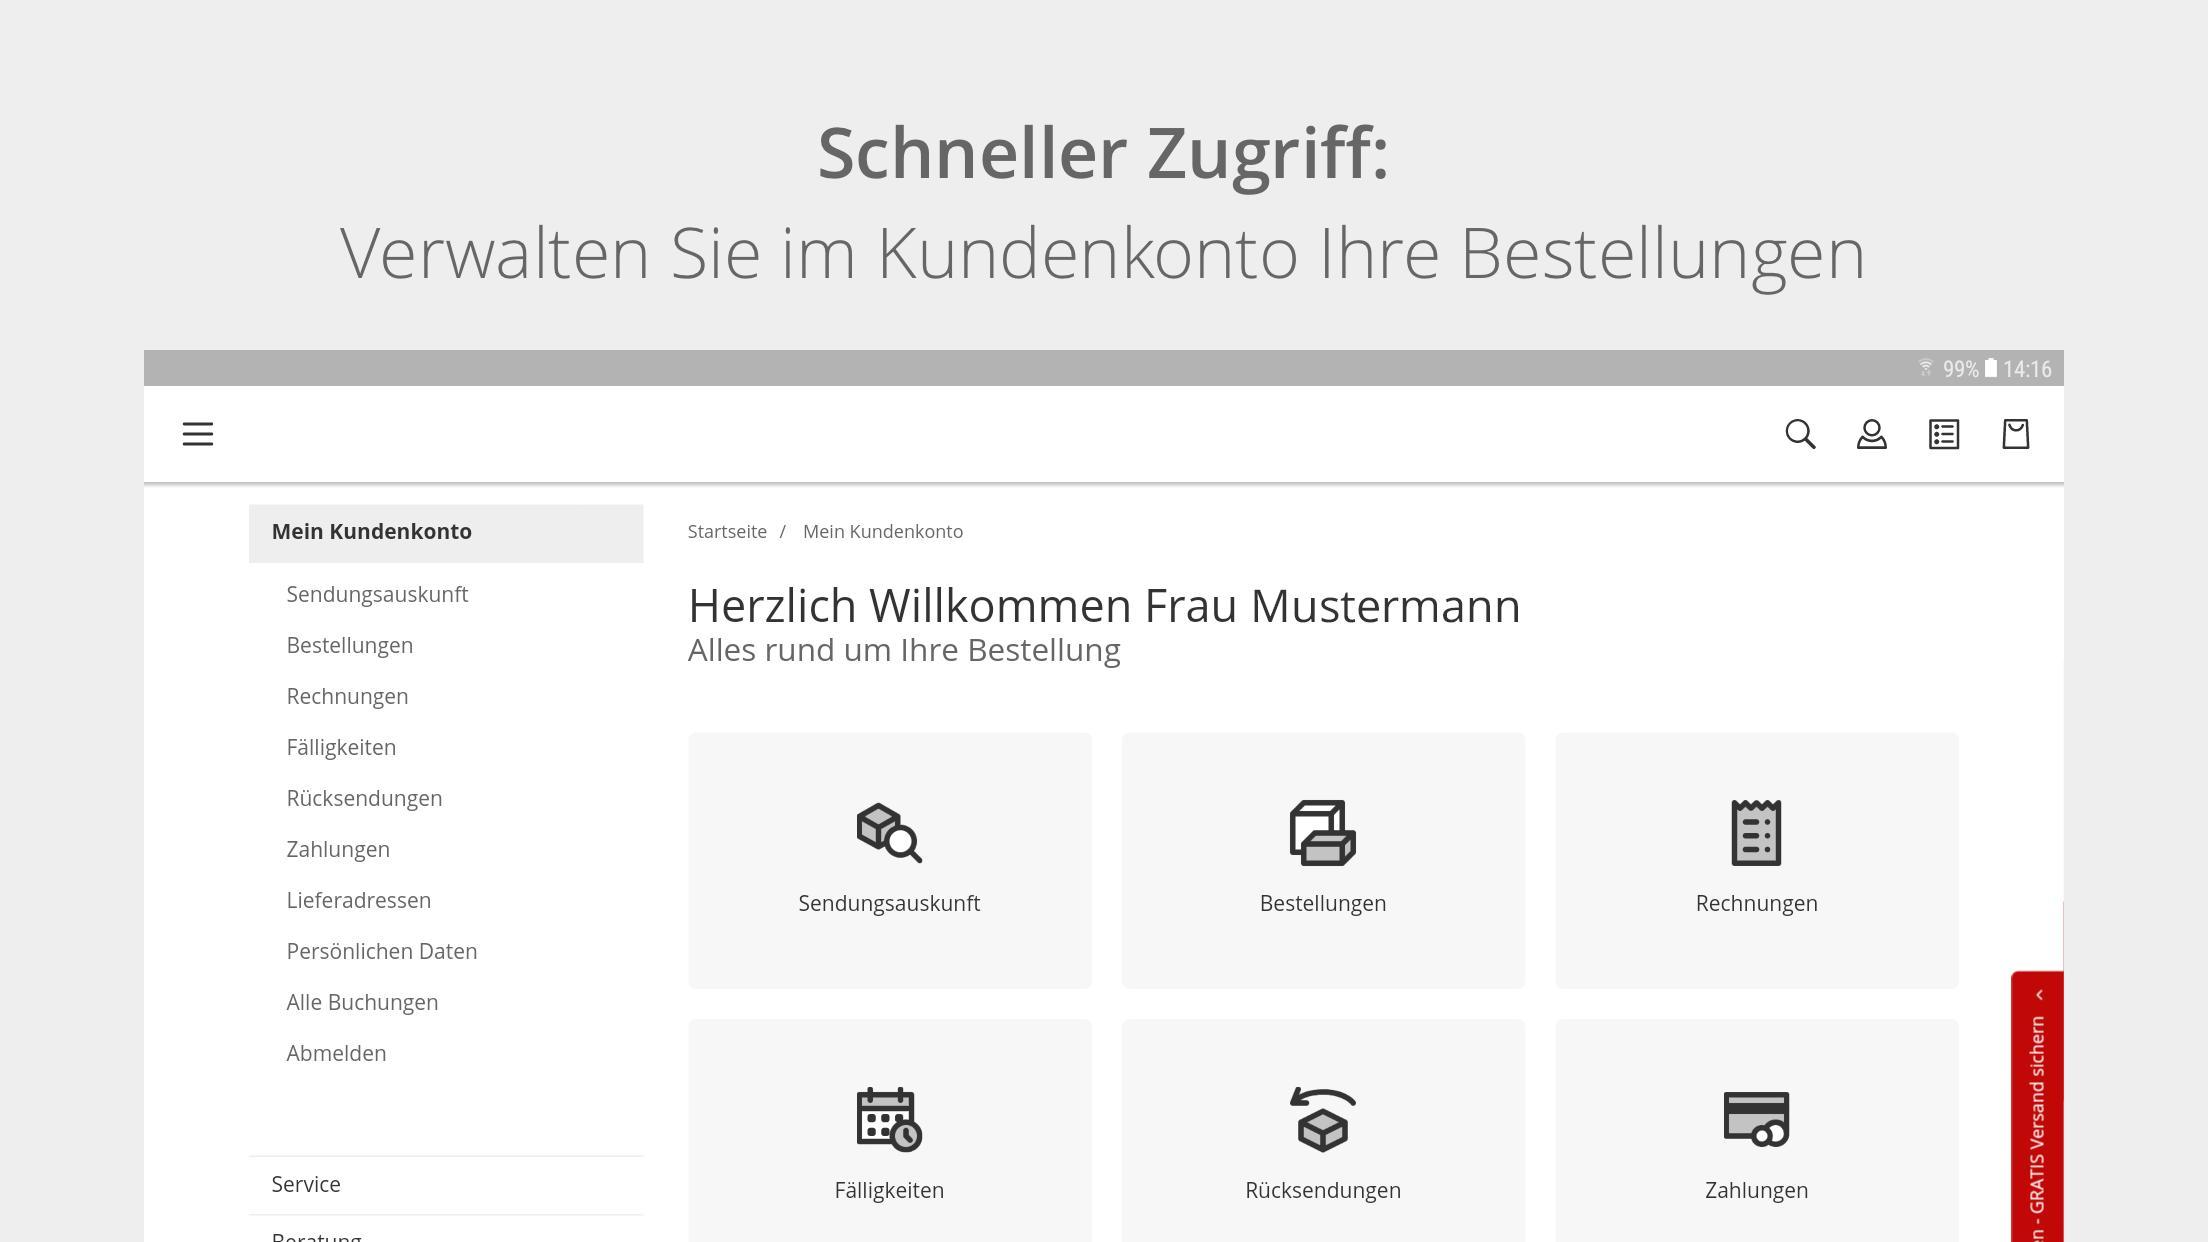 Preis Sportschuhe große Vielfalt Modelle Sieh an! for Android - APK Download